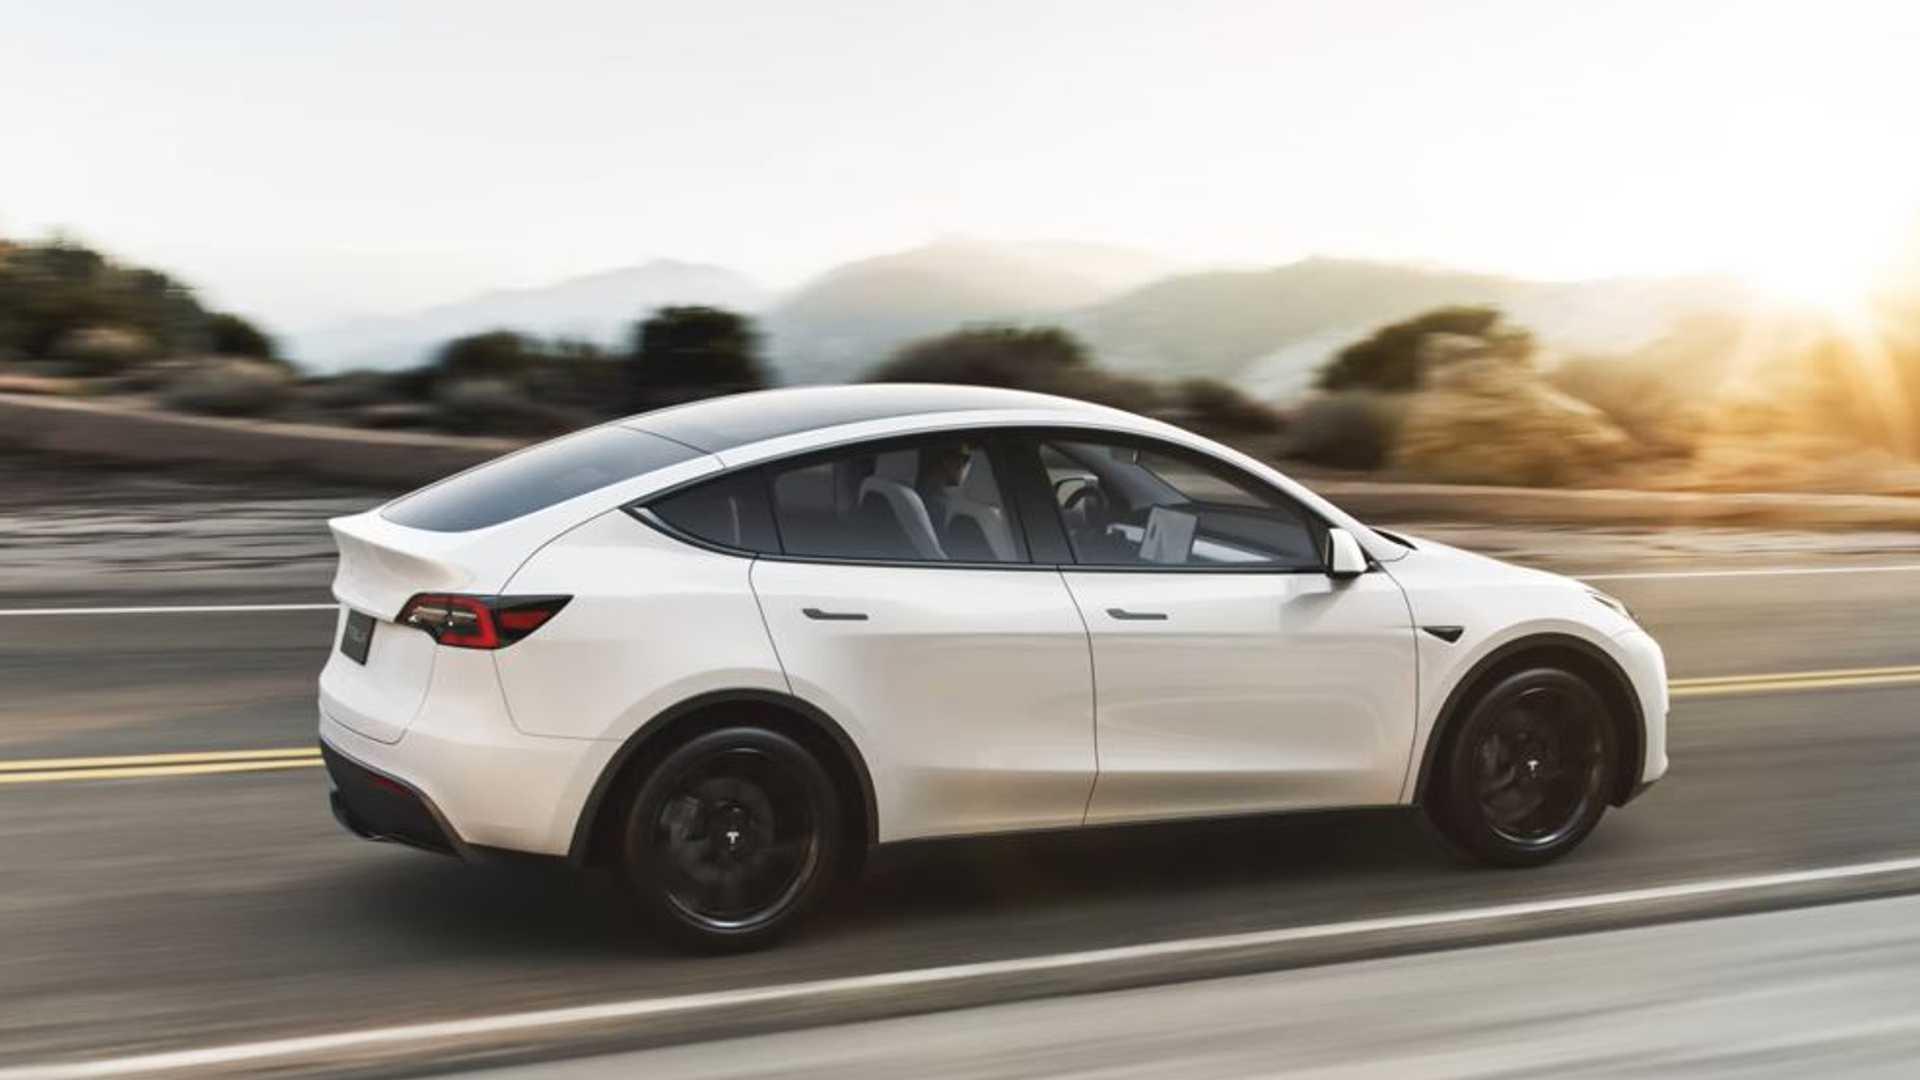 Confirmed: Tesla Model Y with RWD & over 300 miles of range coming soon